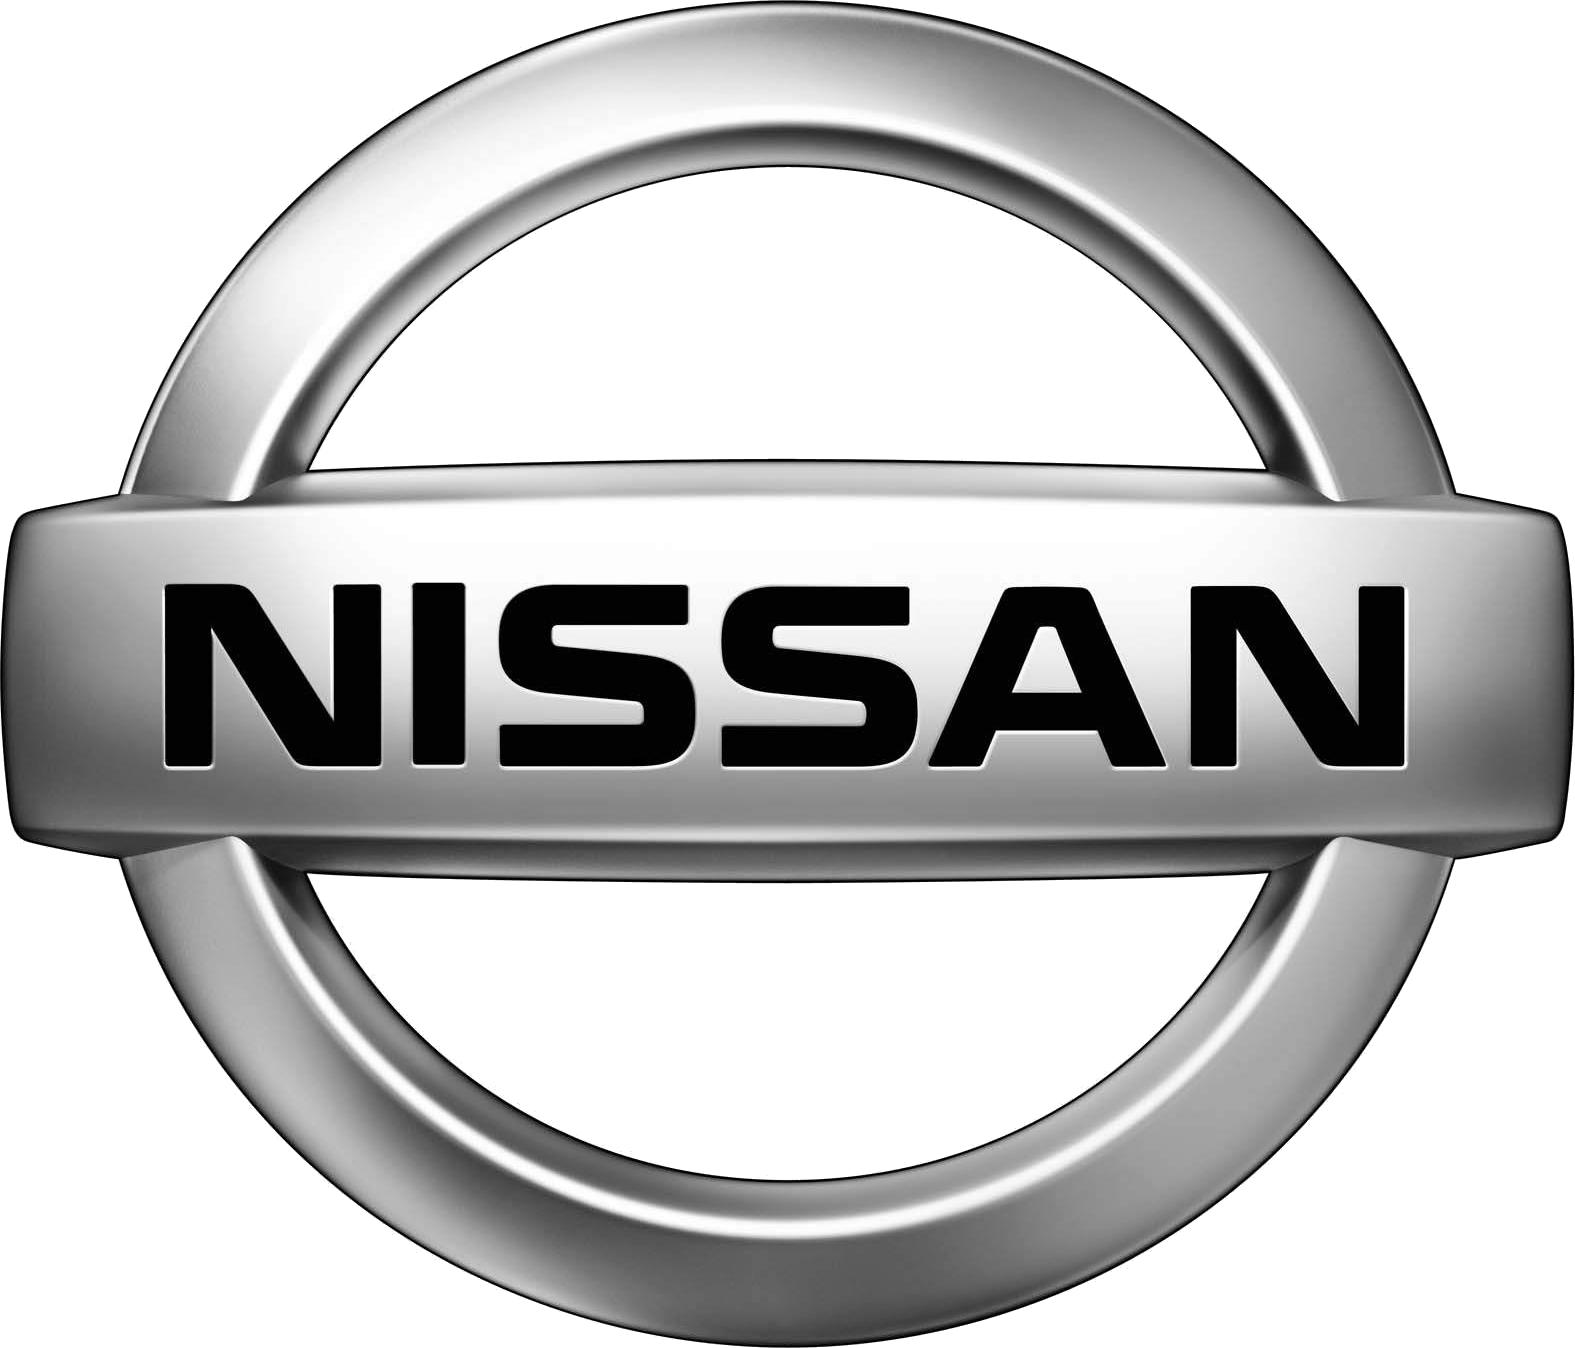 image nissan logo png logopedia fandom powered by wikia rh logos wikia com nissan logo images nissan logo transparent